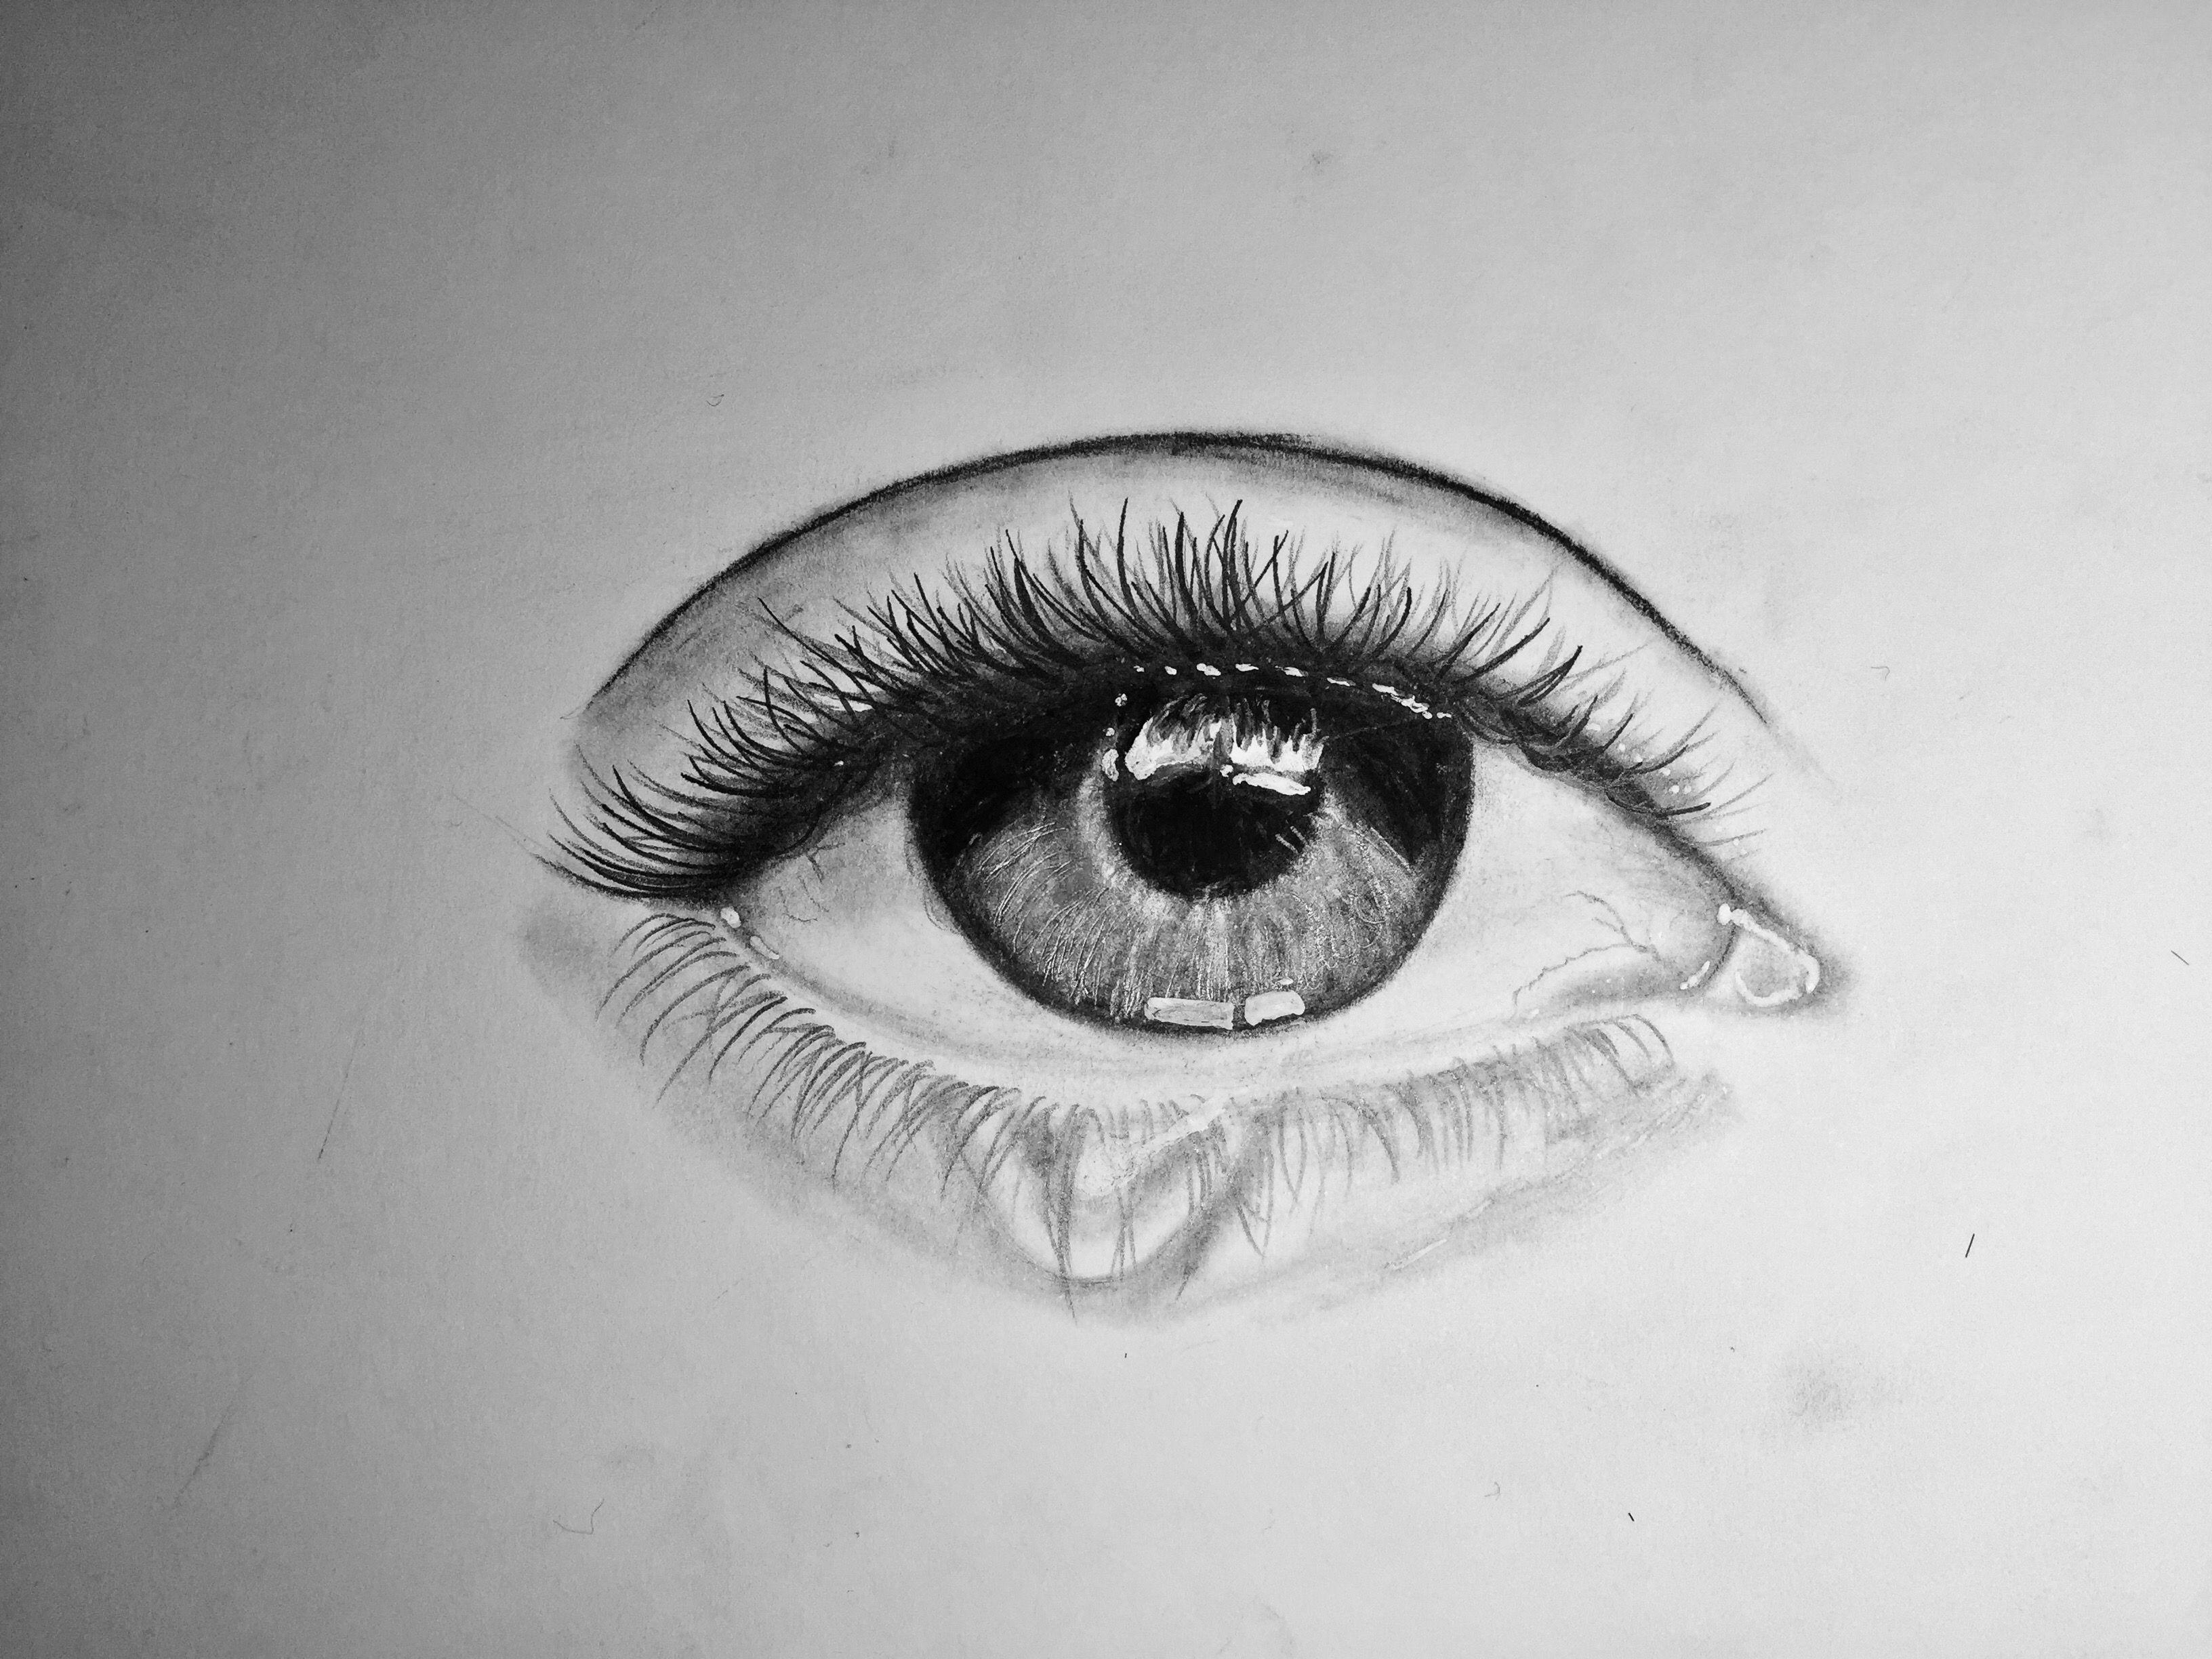 Eye crying right Drawing art Pinterest Drawing art